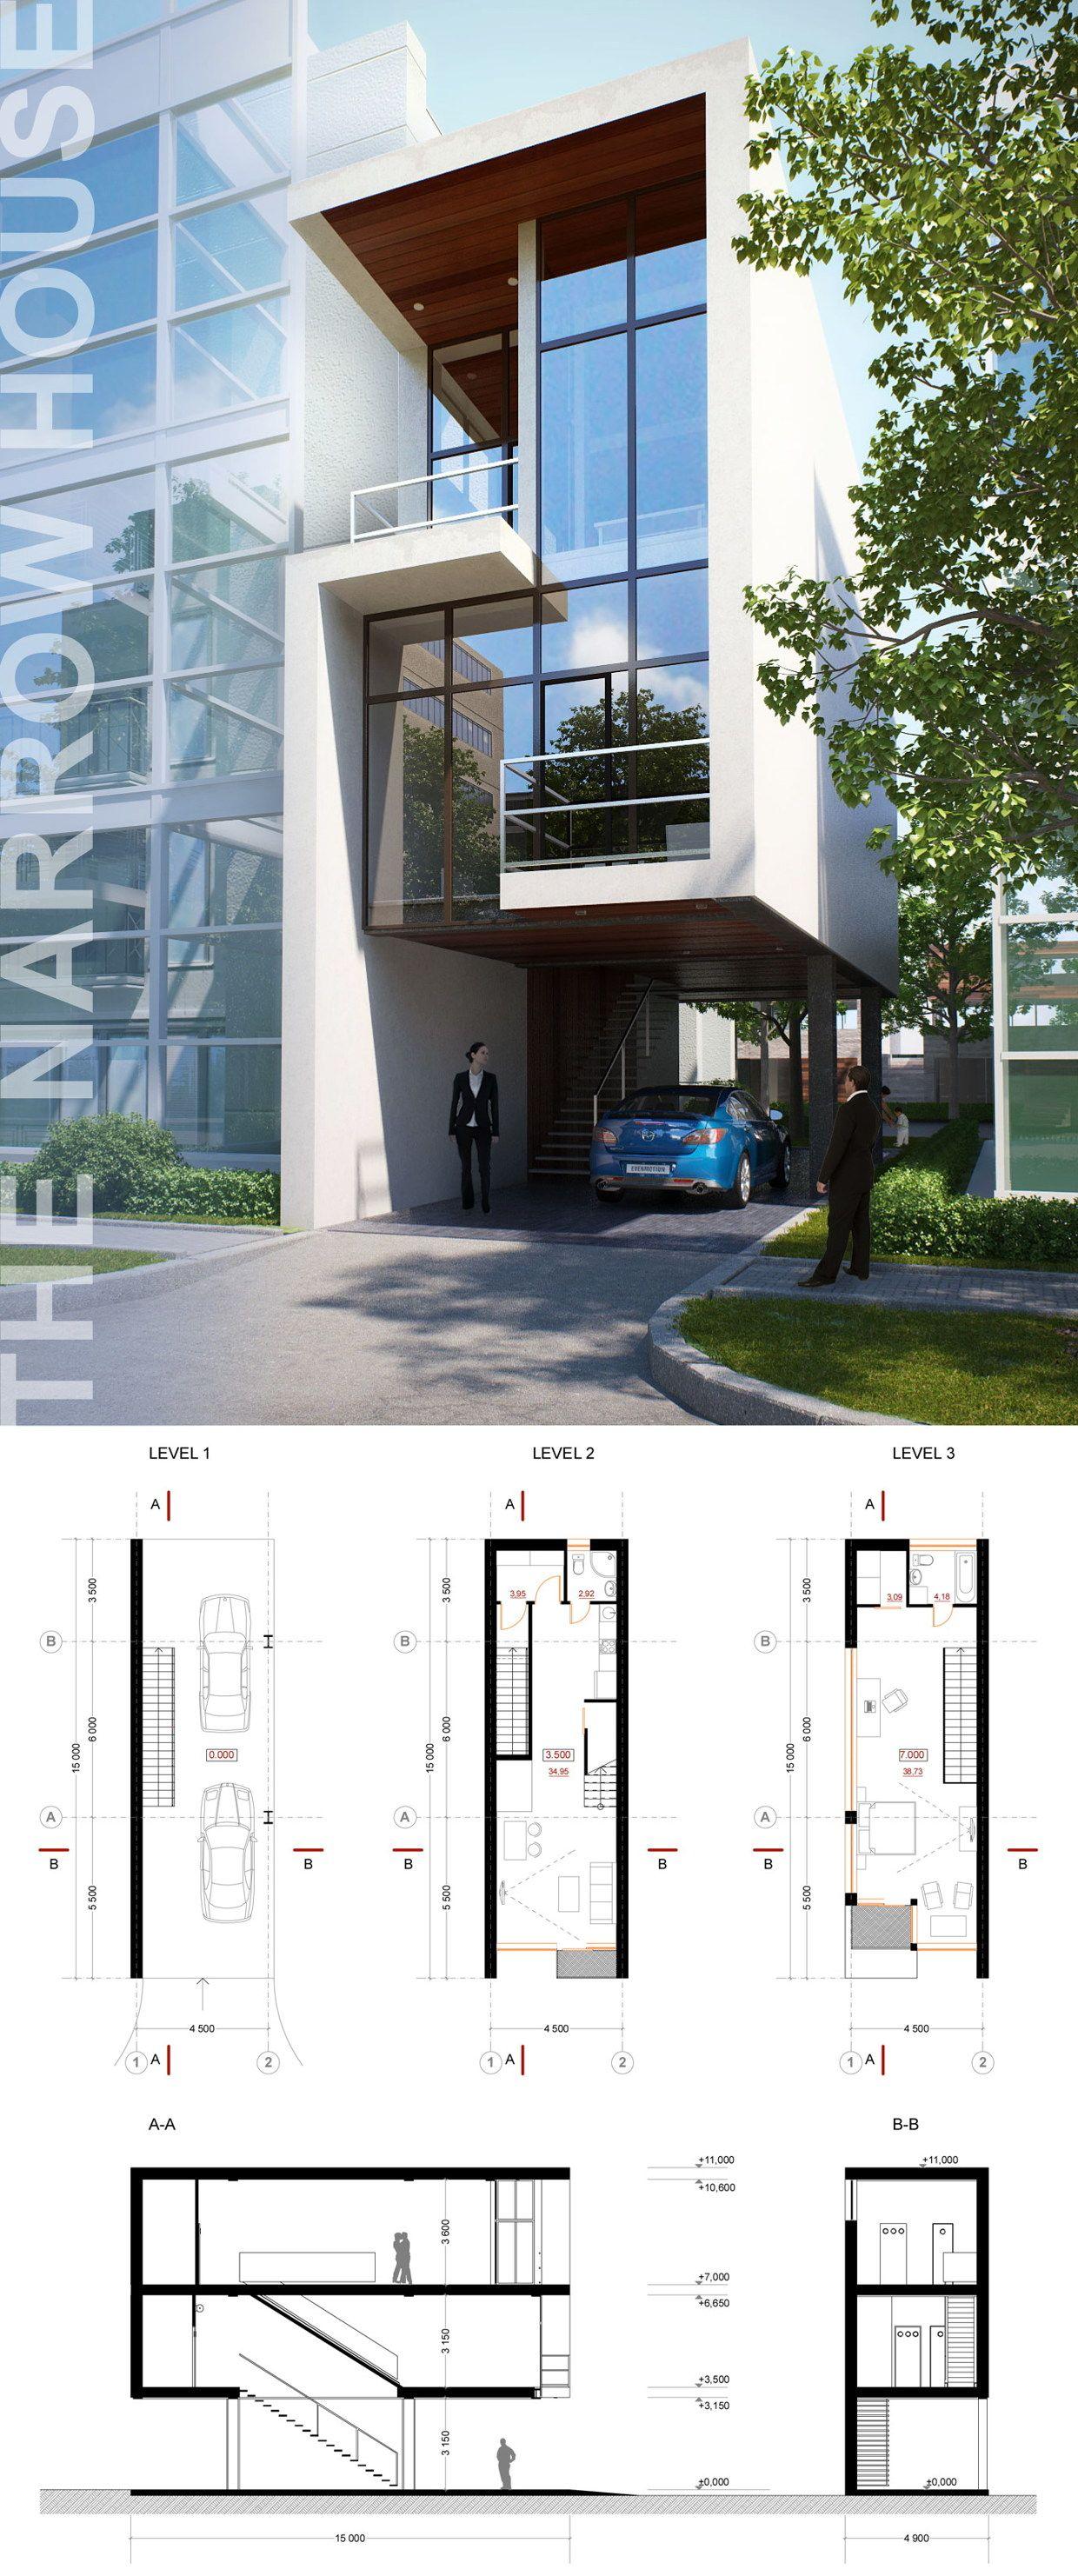 The narrow house on Behance | my narrow House plan | Pinterest ...